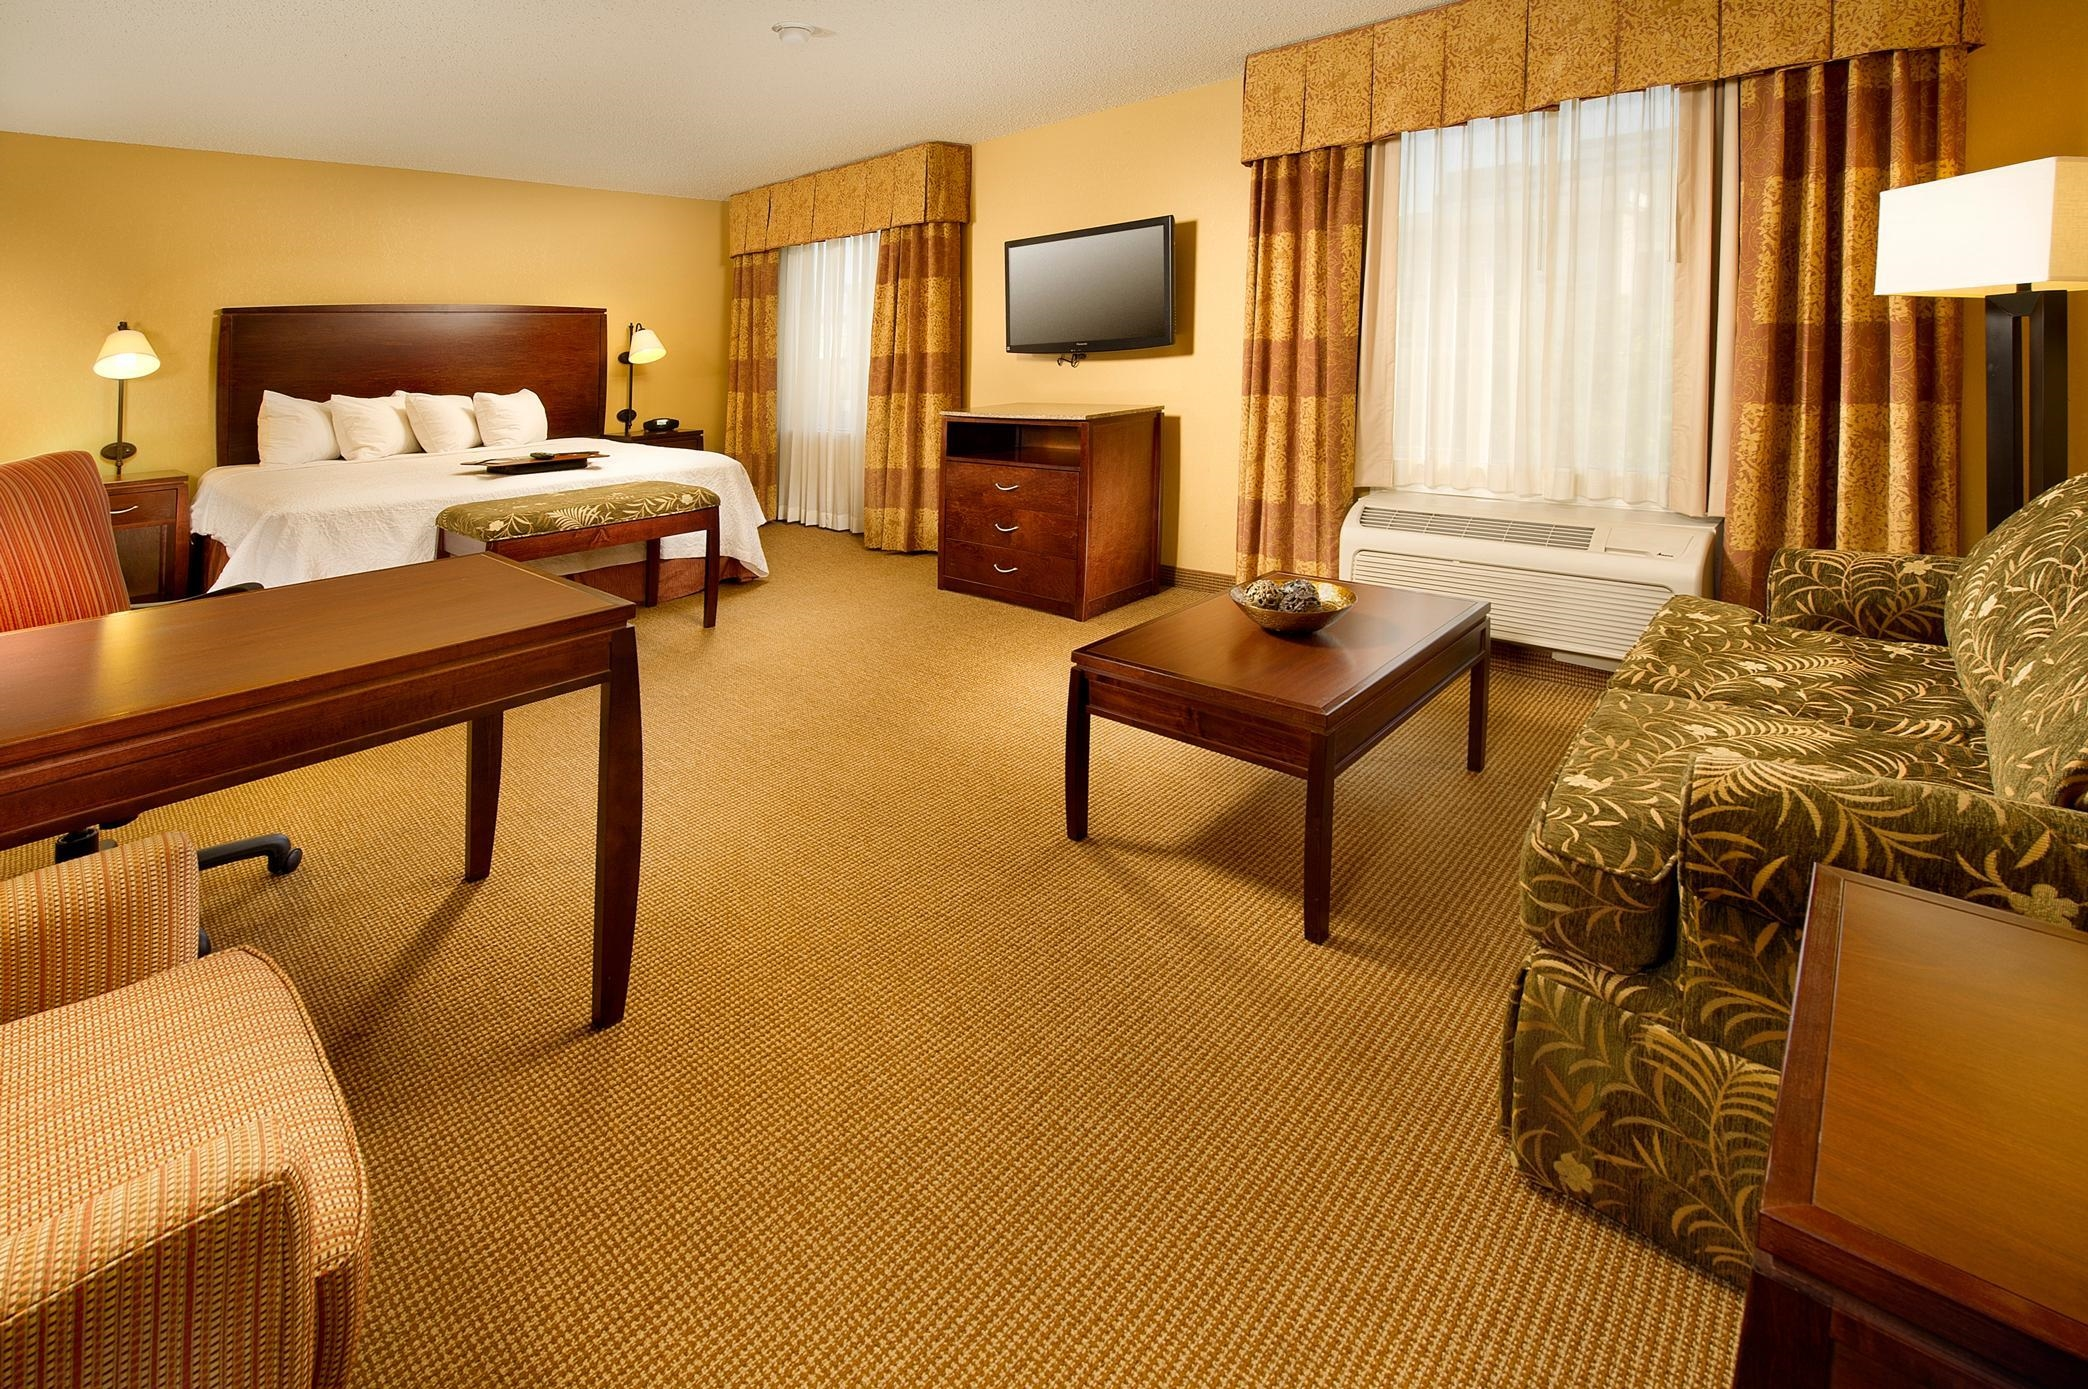 Hampton Inn & Suites San Antonio-Airport image 11